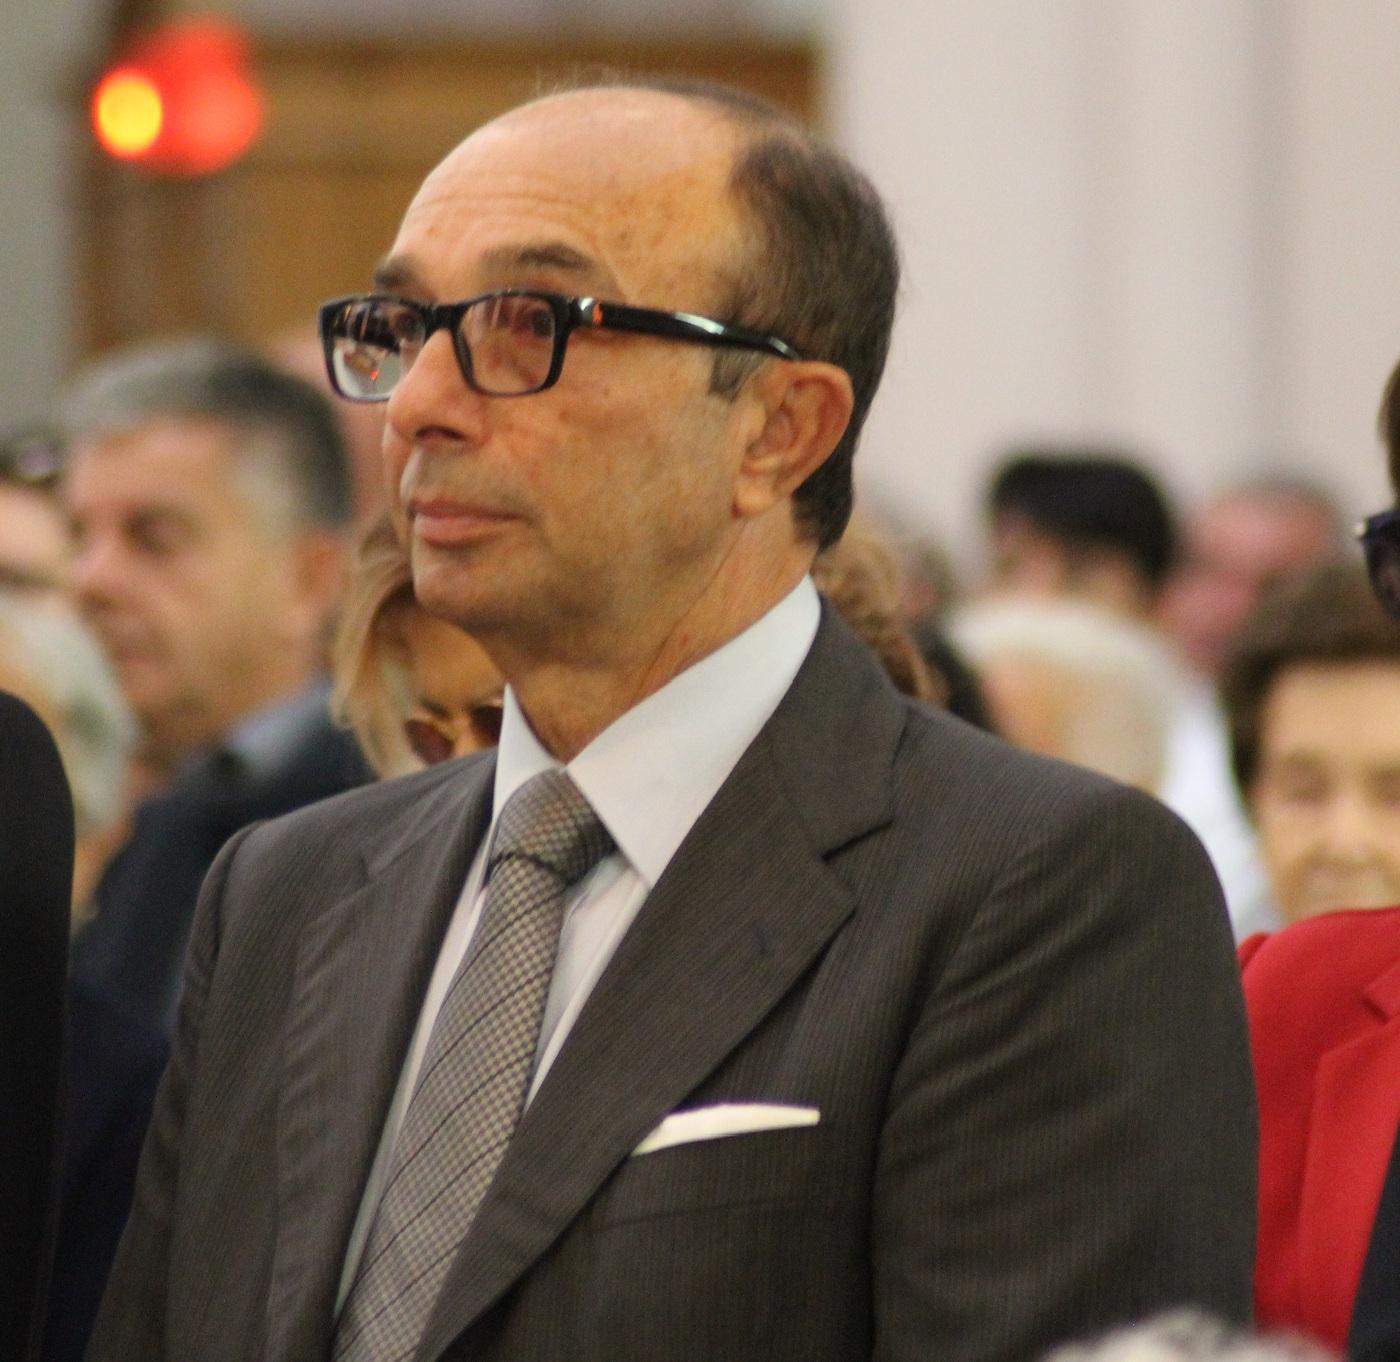 Photo of REGIONALI – Orgoglio Molise presenta stasera la lista a Castelpetroso | Molise Network